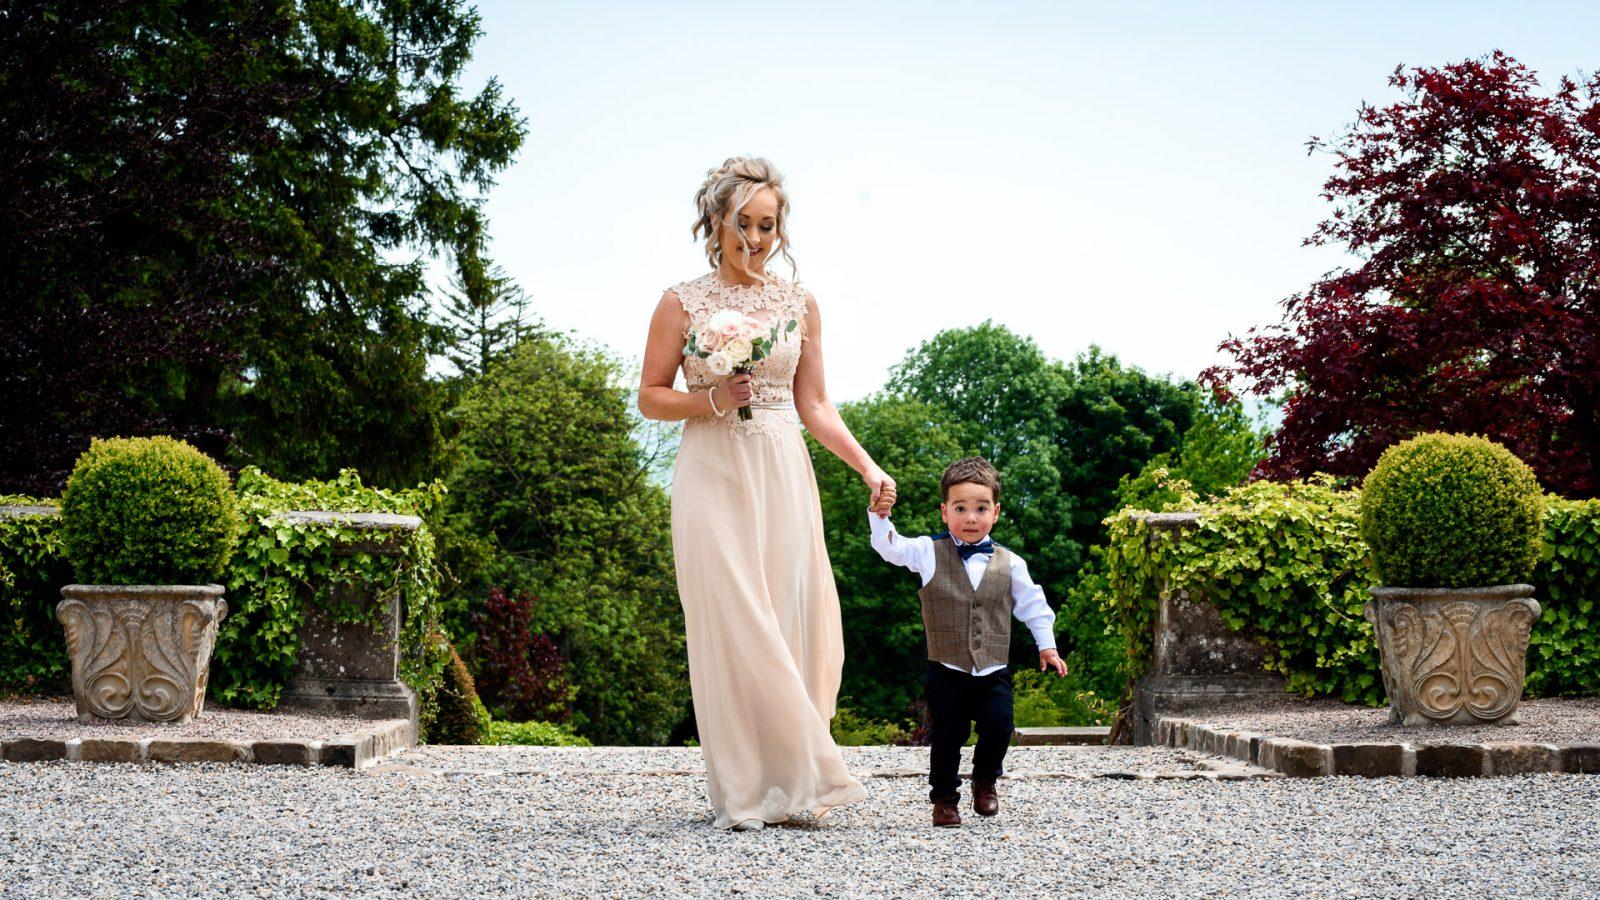 best-wedding-phtos-2018-kimberley-and-josephs-son